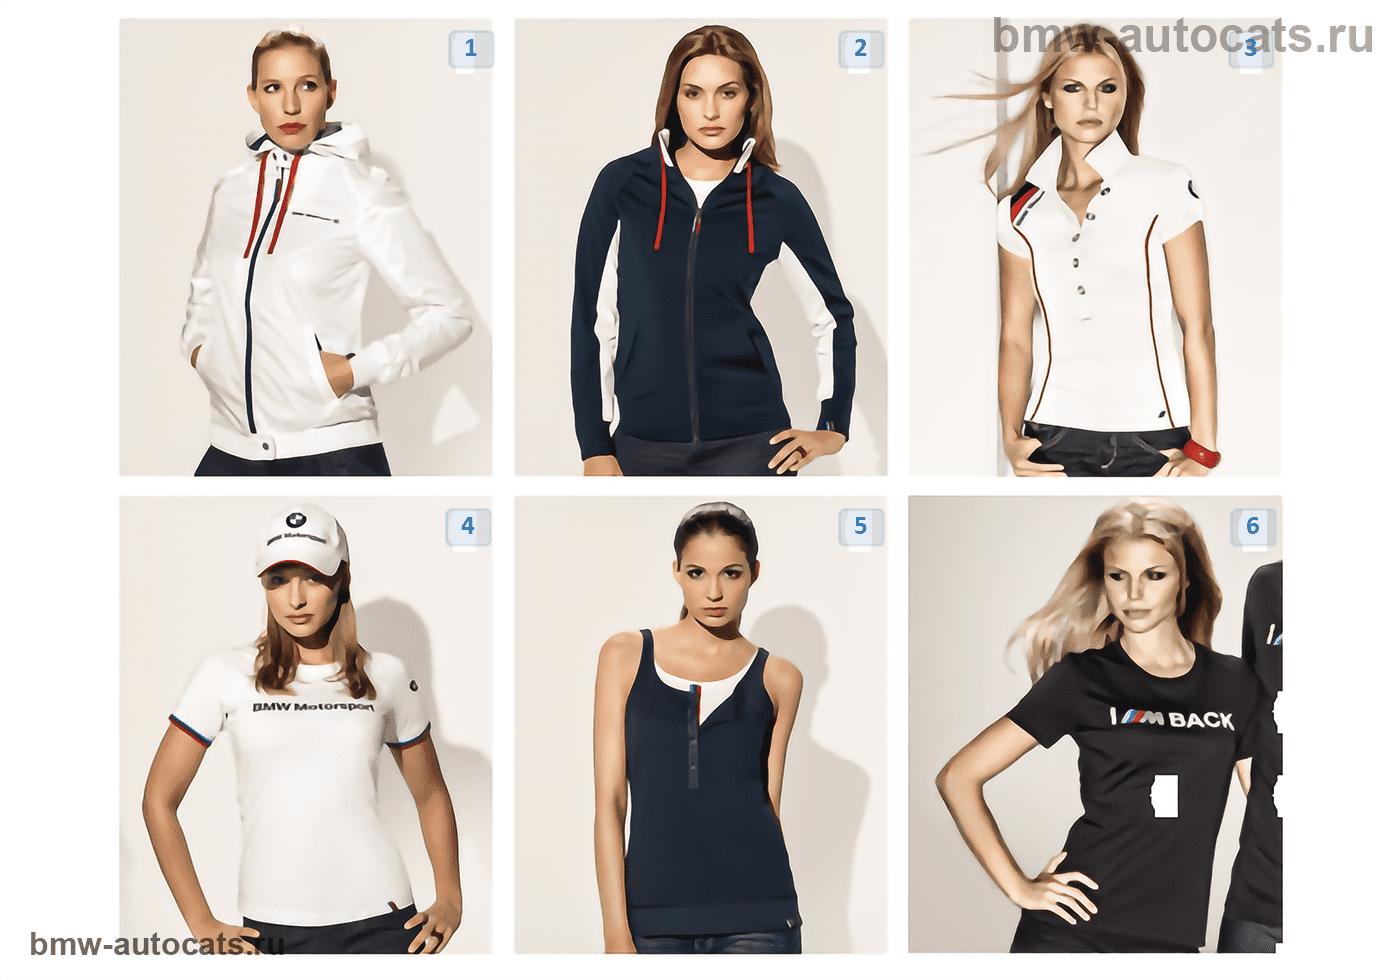 Motorsport — женская одежда 2012/13